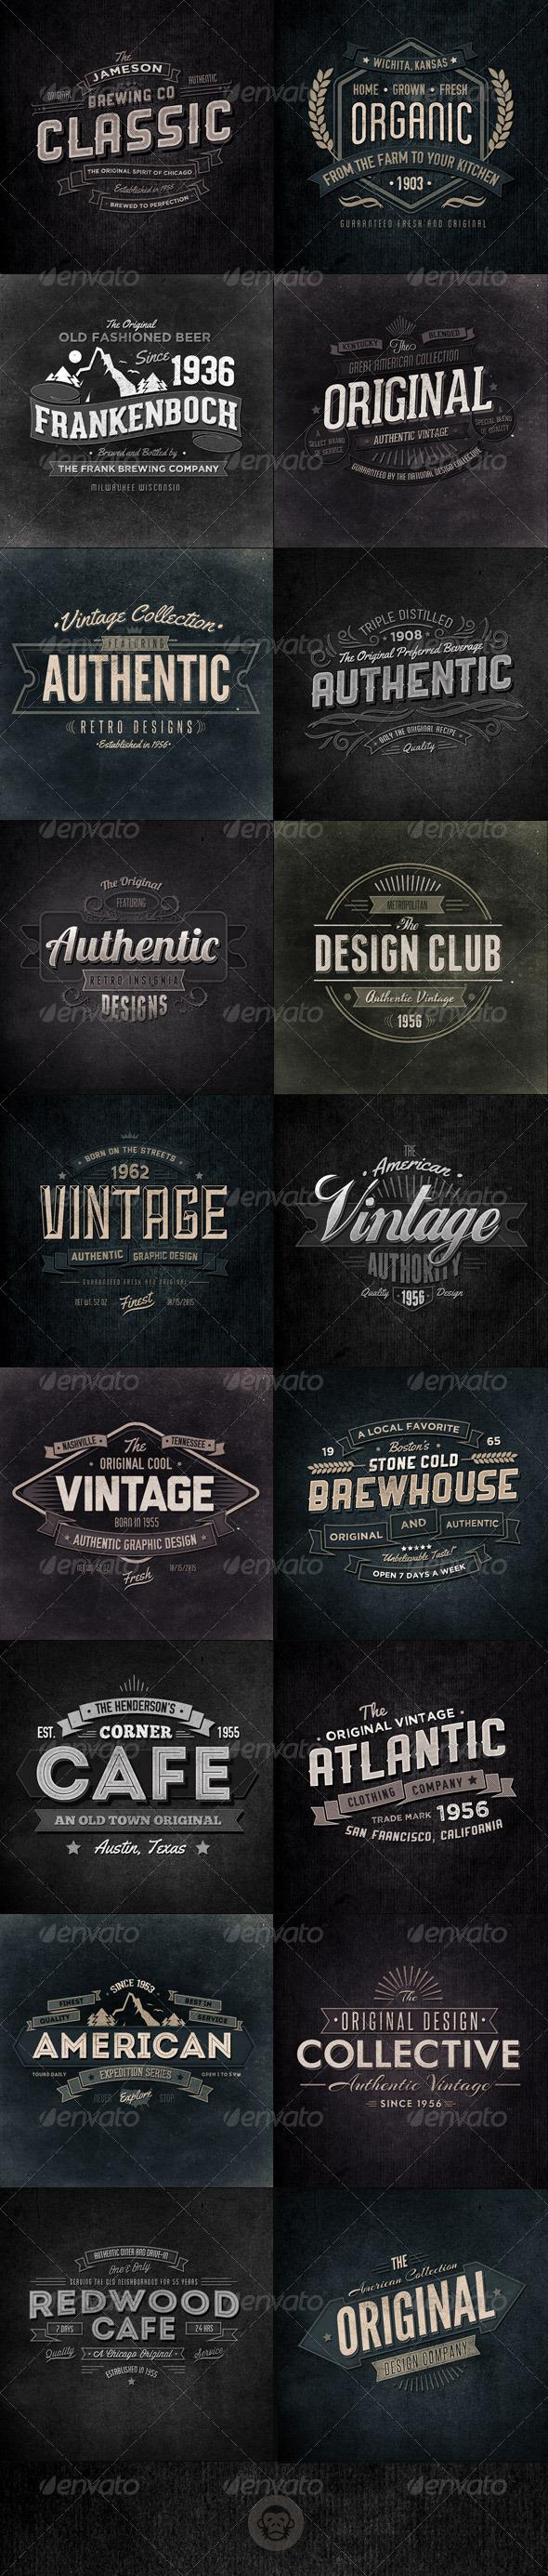 GraphicRiver 18 Retro Typographic Insignia and Badges Bundle 6545822